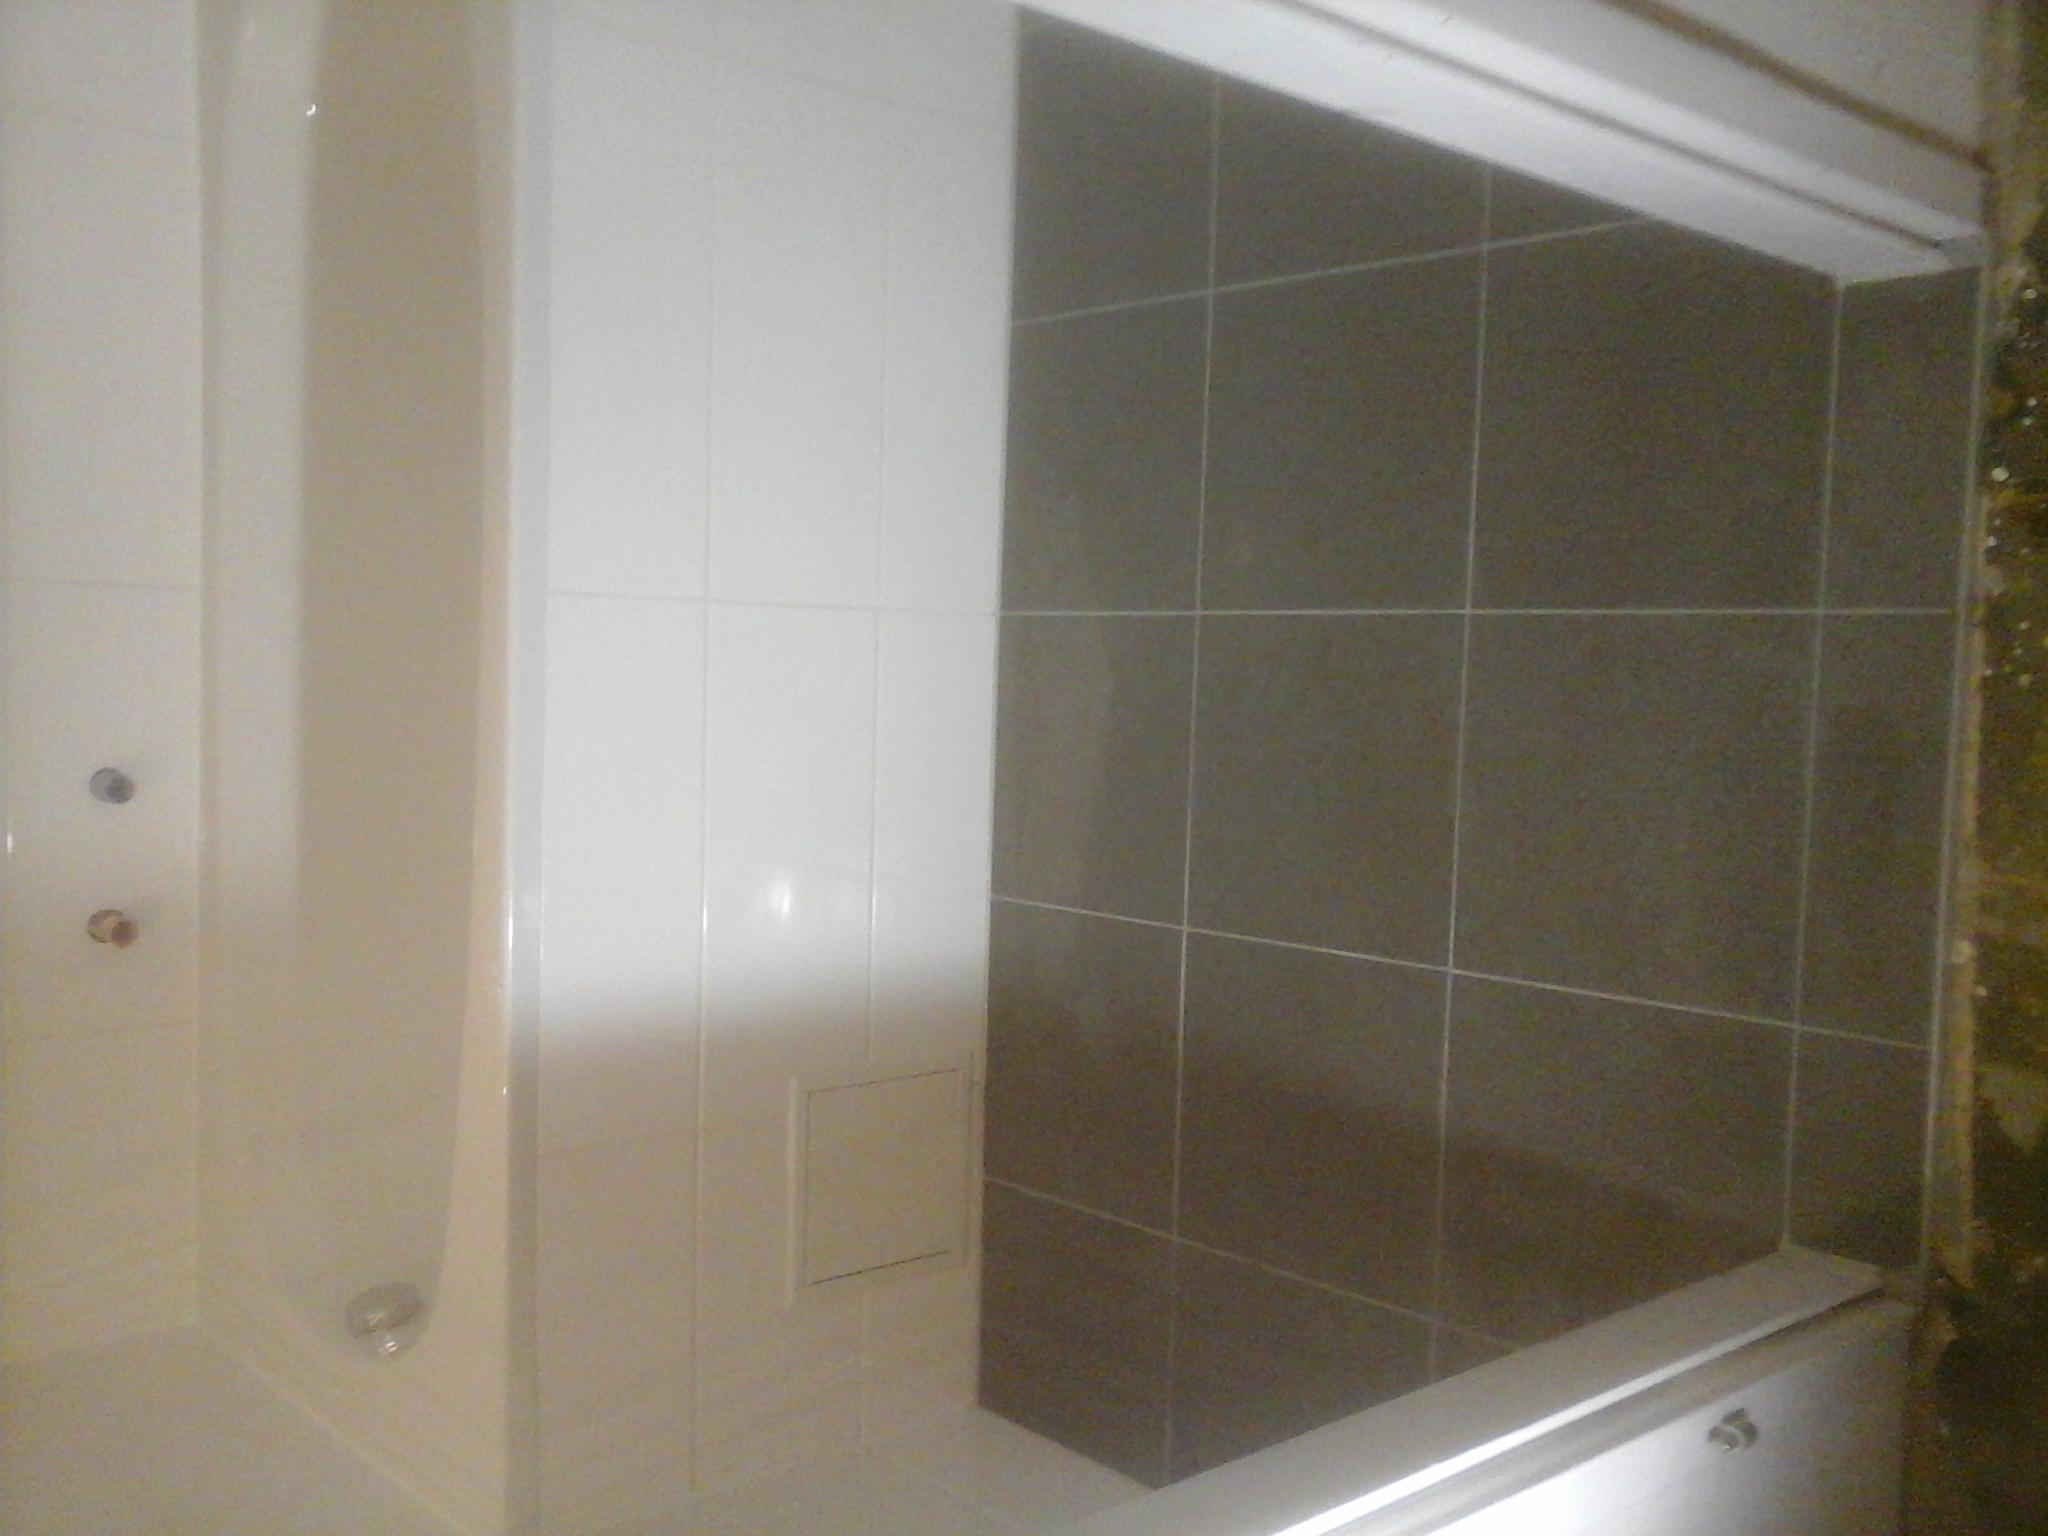 Badezimmer Badewanne Grau Weiß